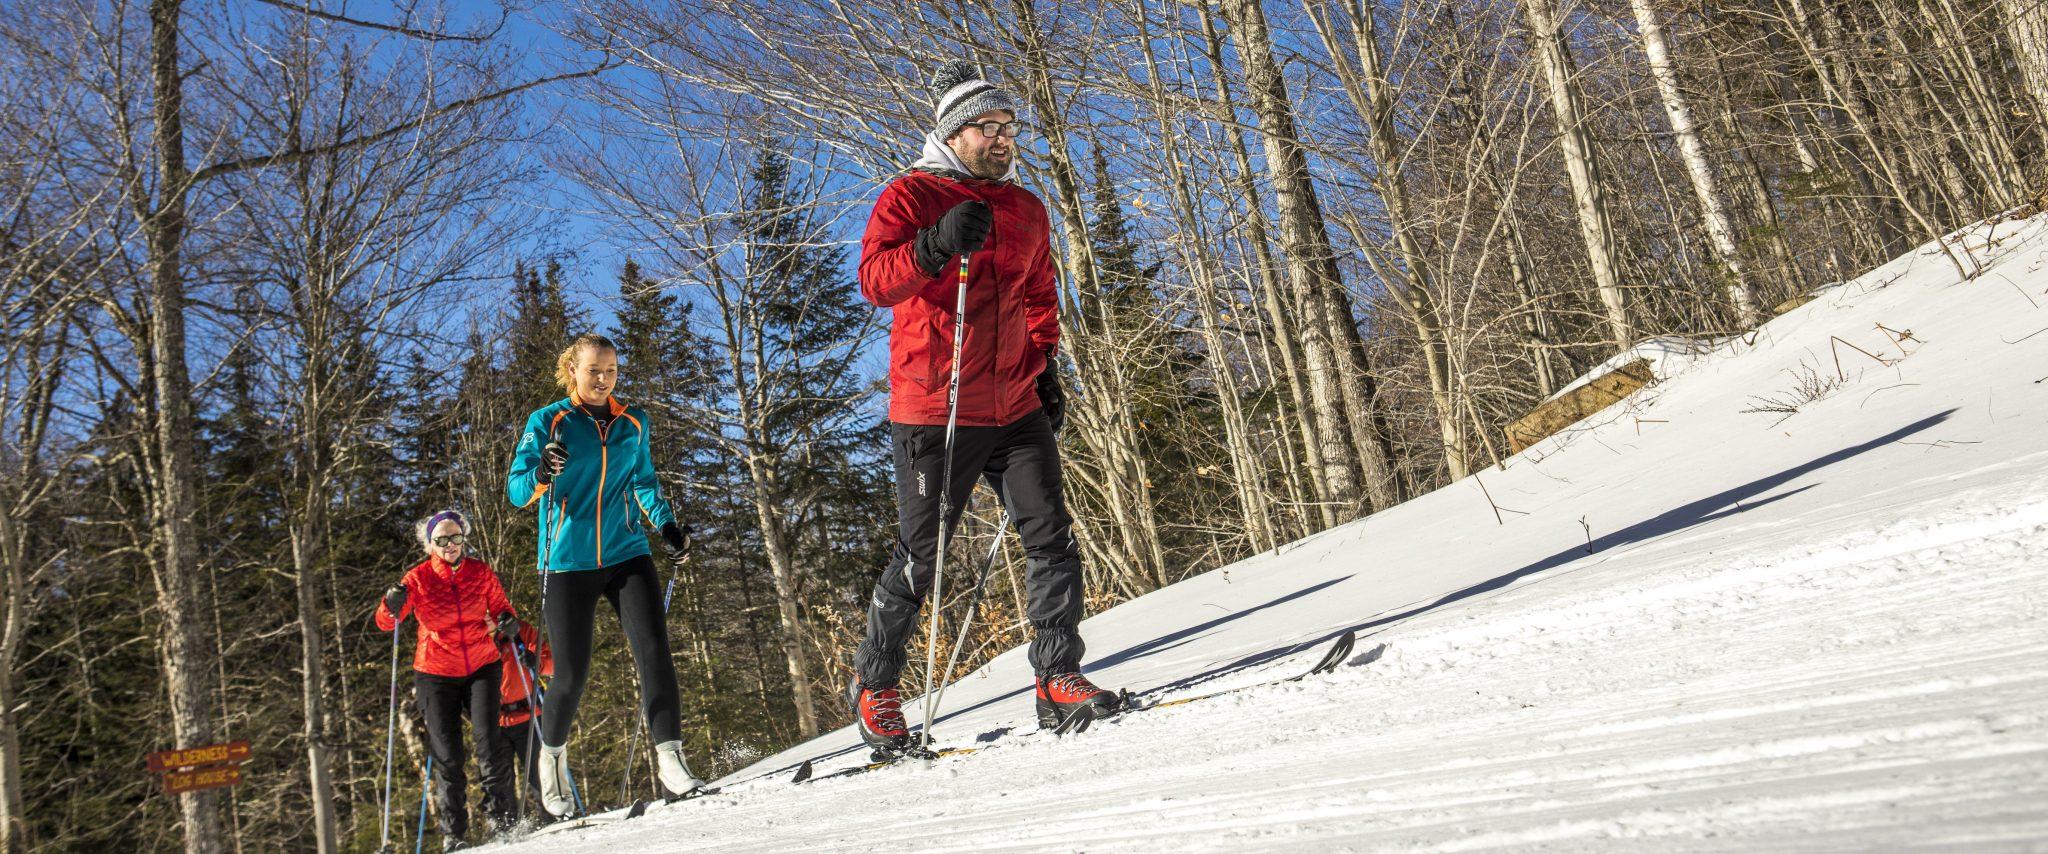 Winter actvity on a sunny day at Garnet Hill Lodge. photo by Nancie Battaglia